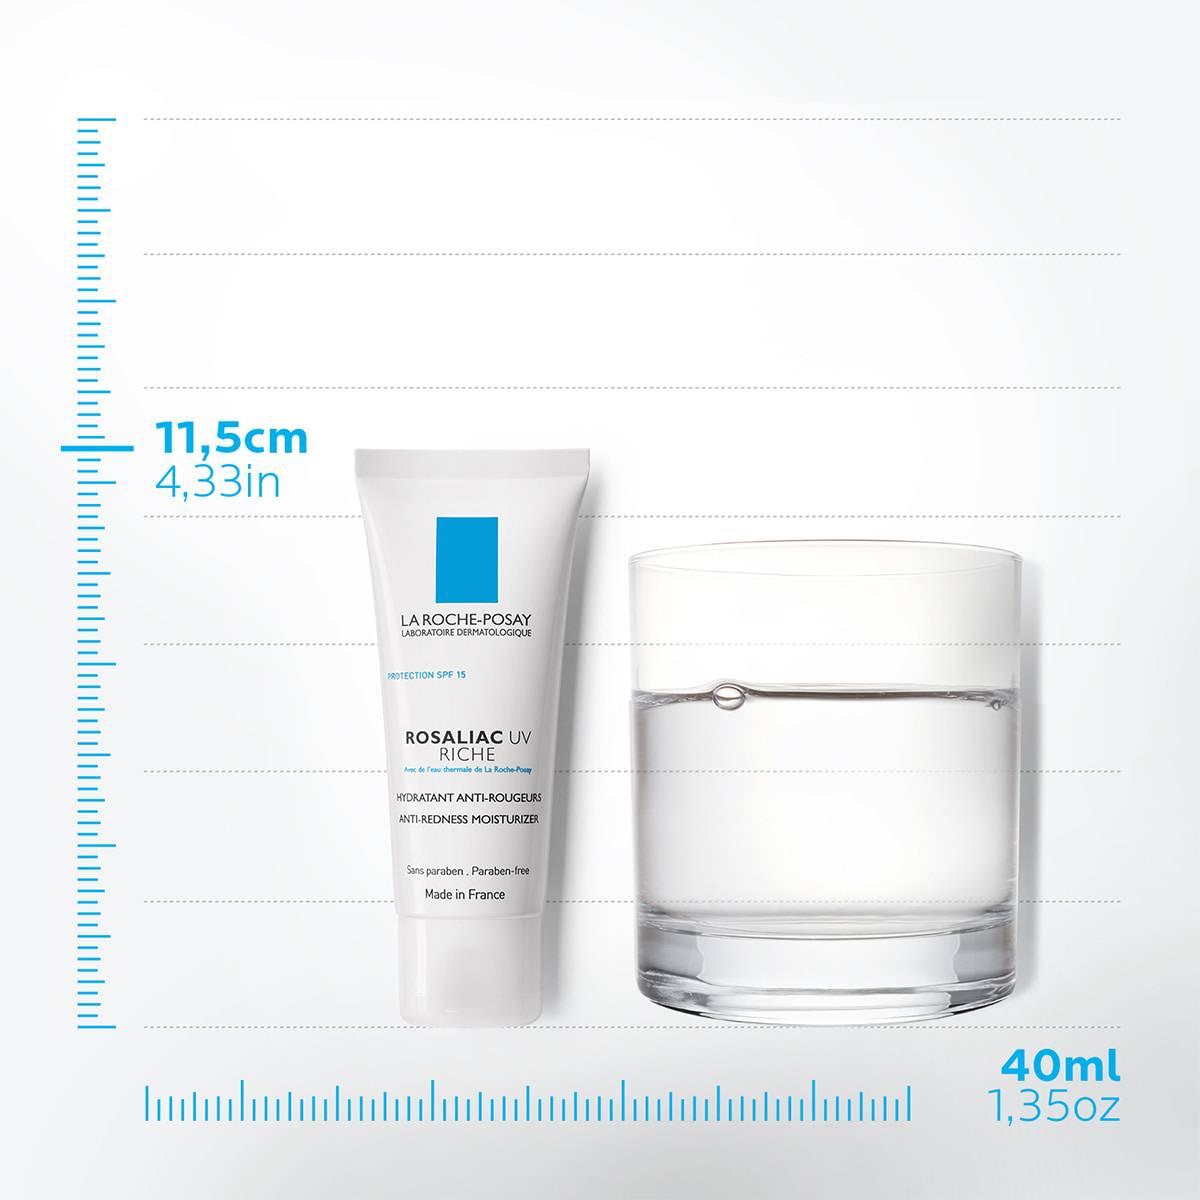 La Roche Posay Produktsida Ansiktsvård Rosaliac UV Rich Spf15 40ml 33378